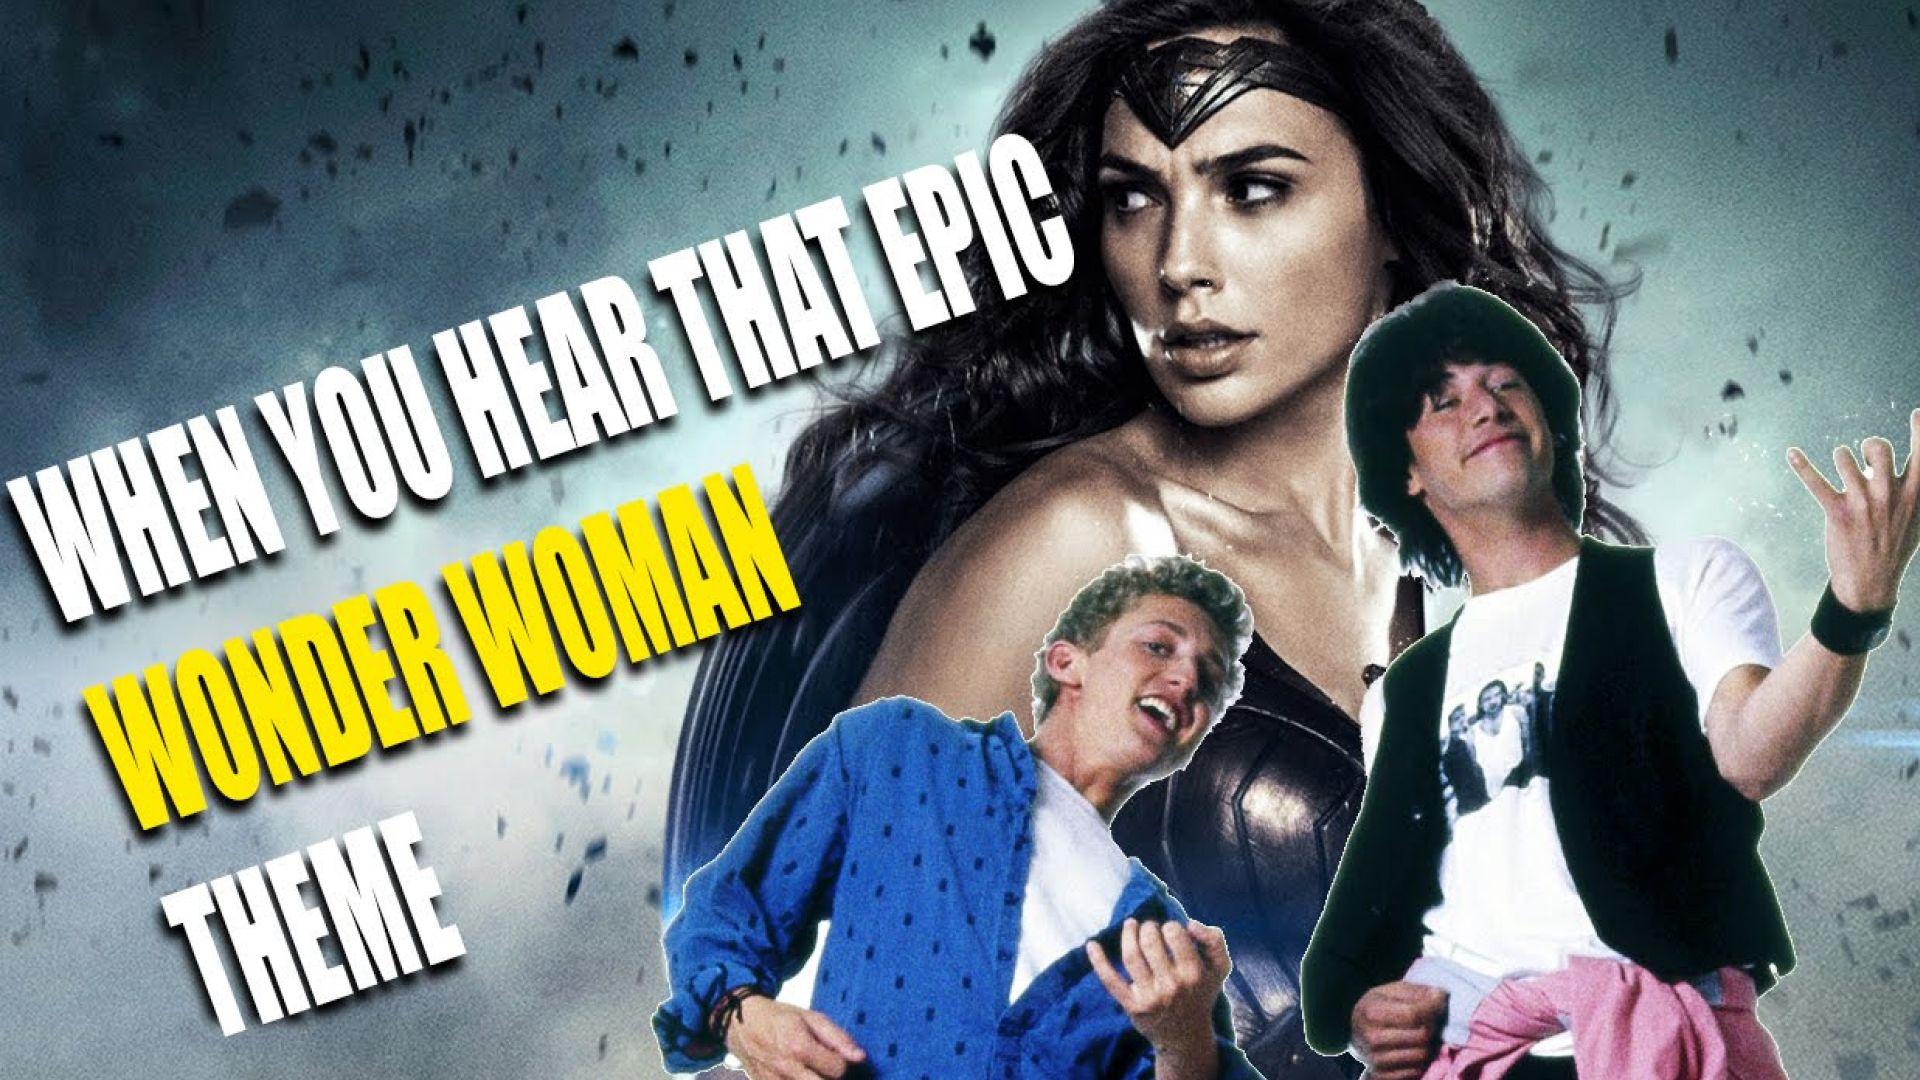 When You Hear That Epic Wonder Woman Guitar Music